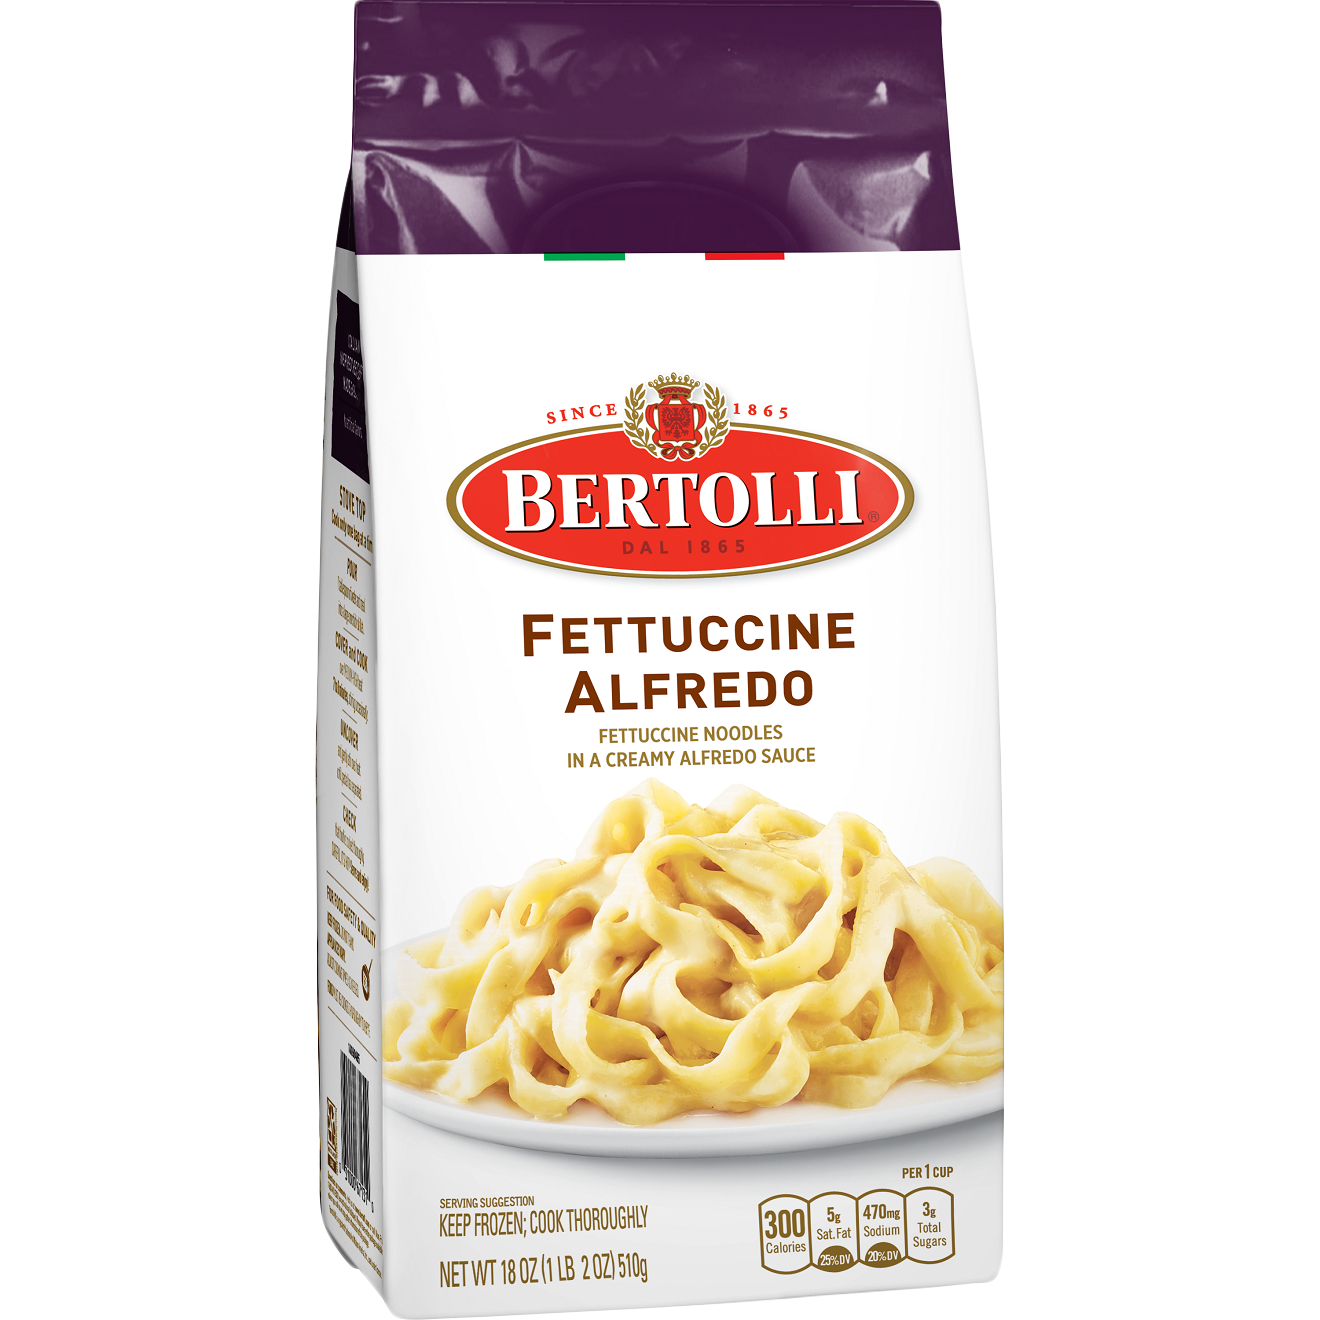 Bertolli Fettuccine Alfredo Bertolli